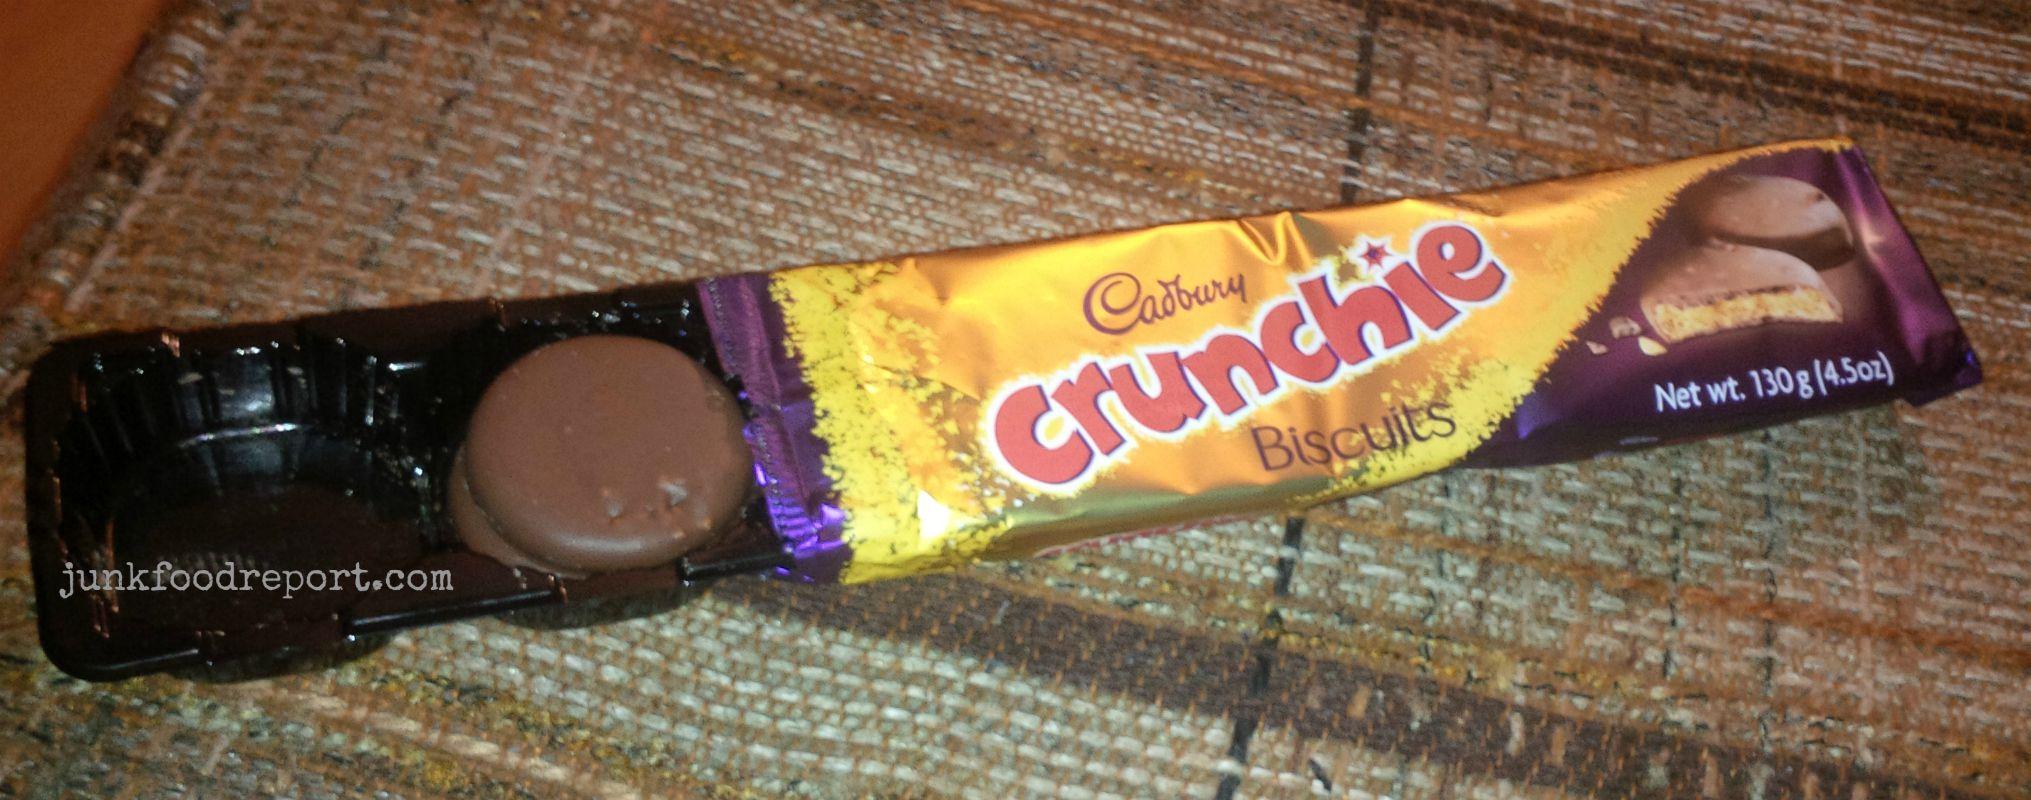 Cadbury's Crunchie Biscuits